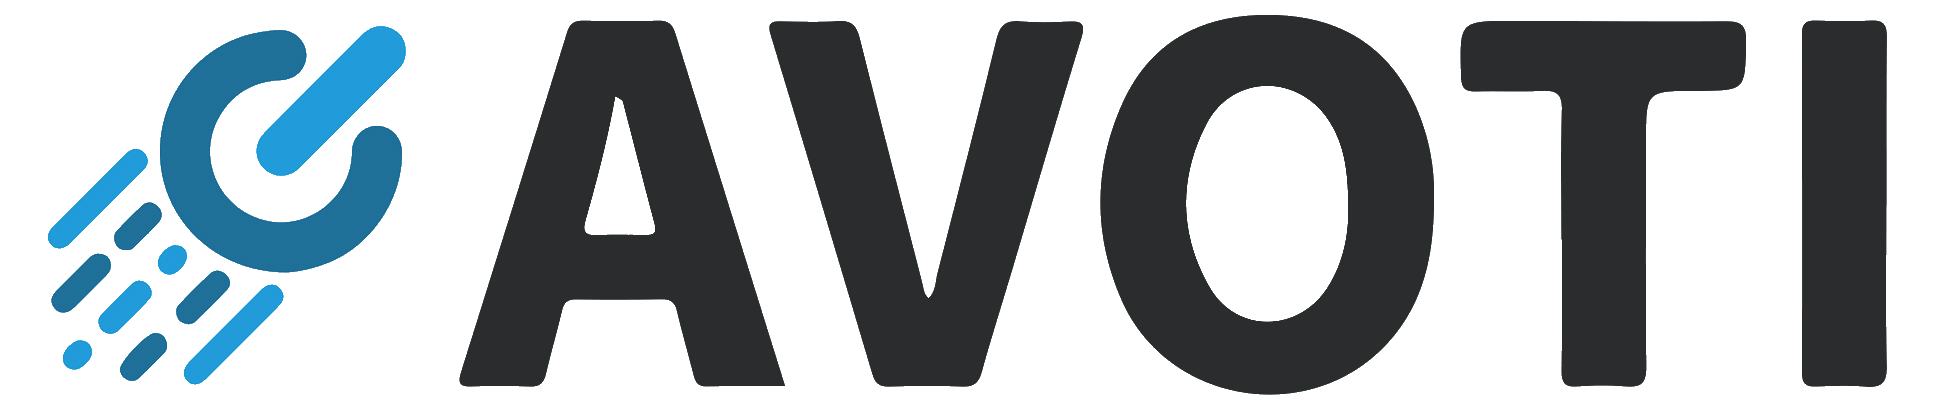 Avoti | Profesjonalne Usługi Informatyczne